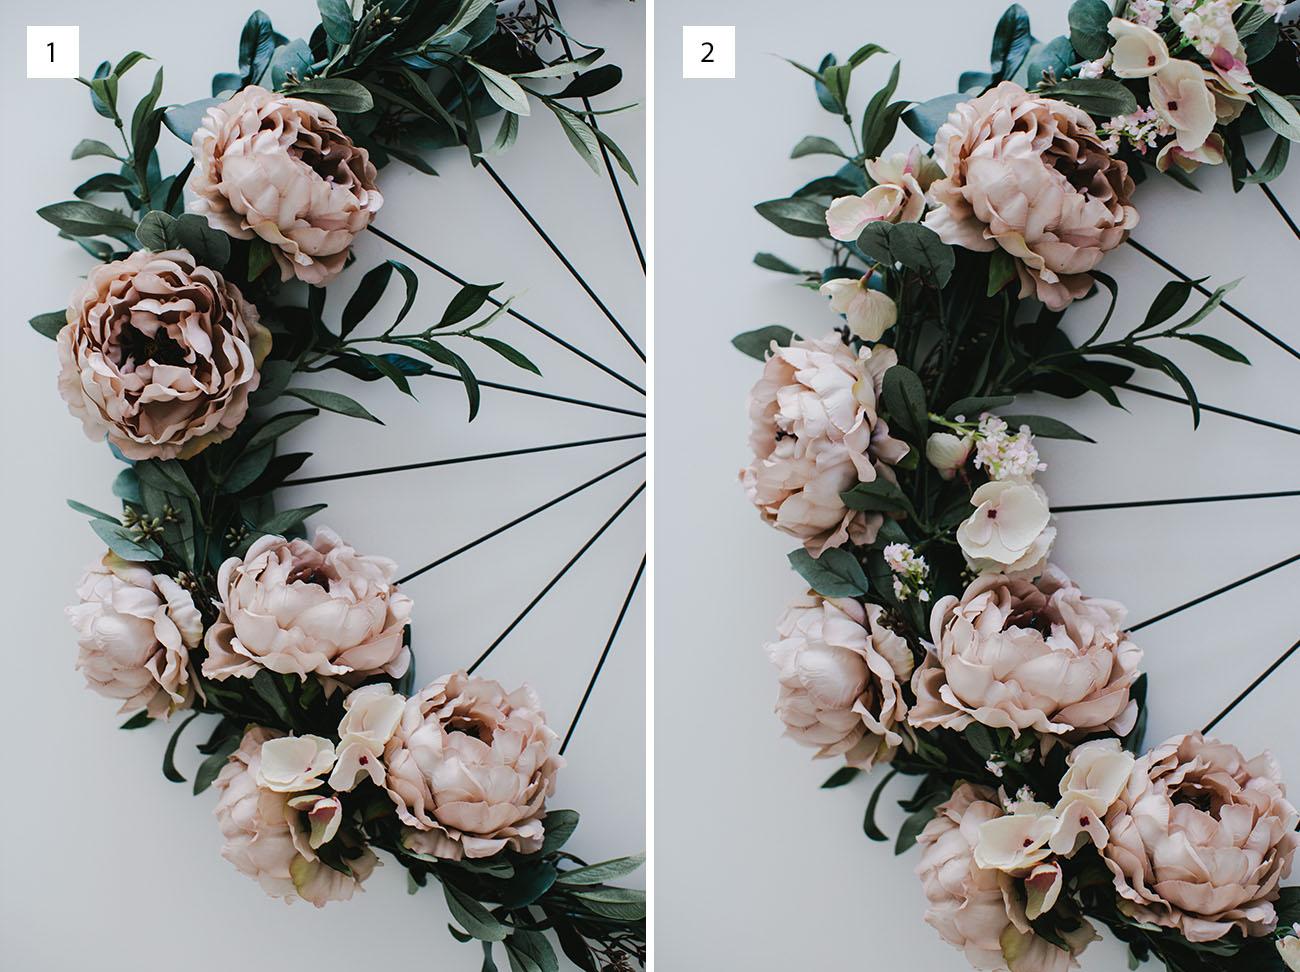 DIY Floral Wheel Garland